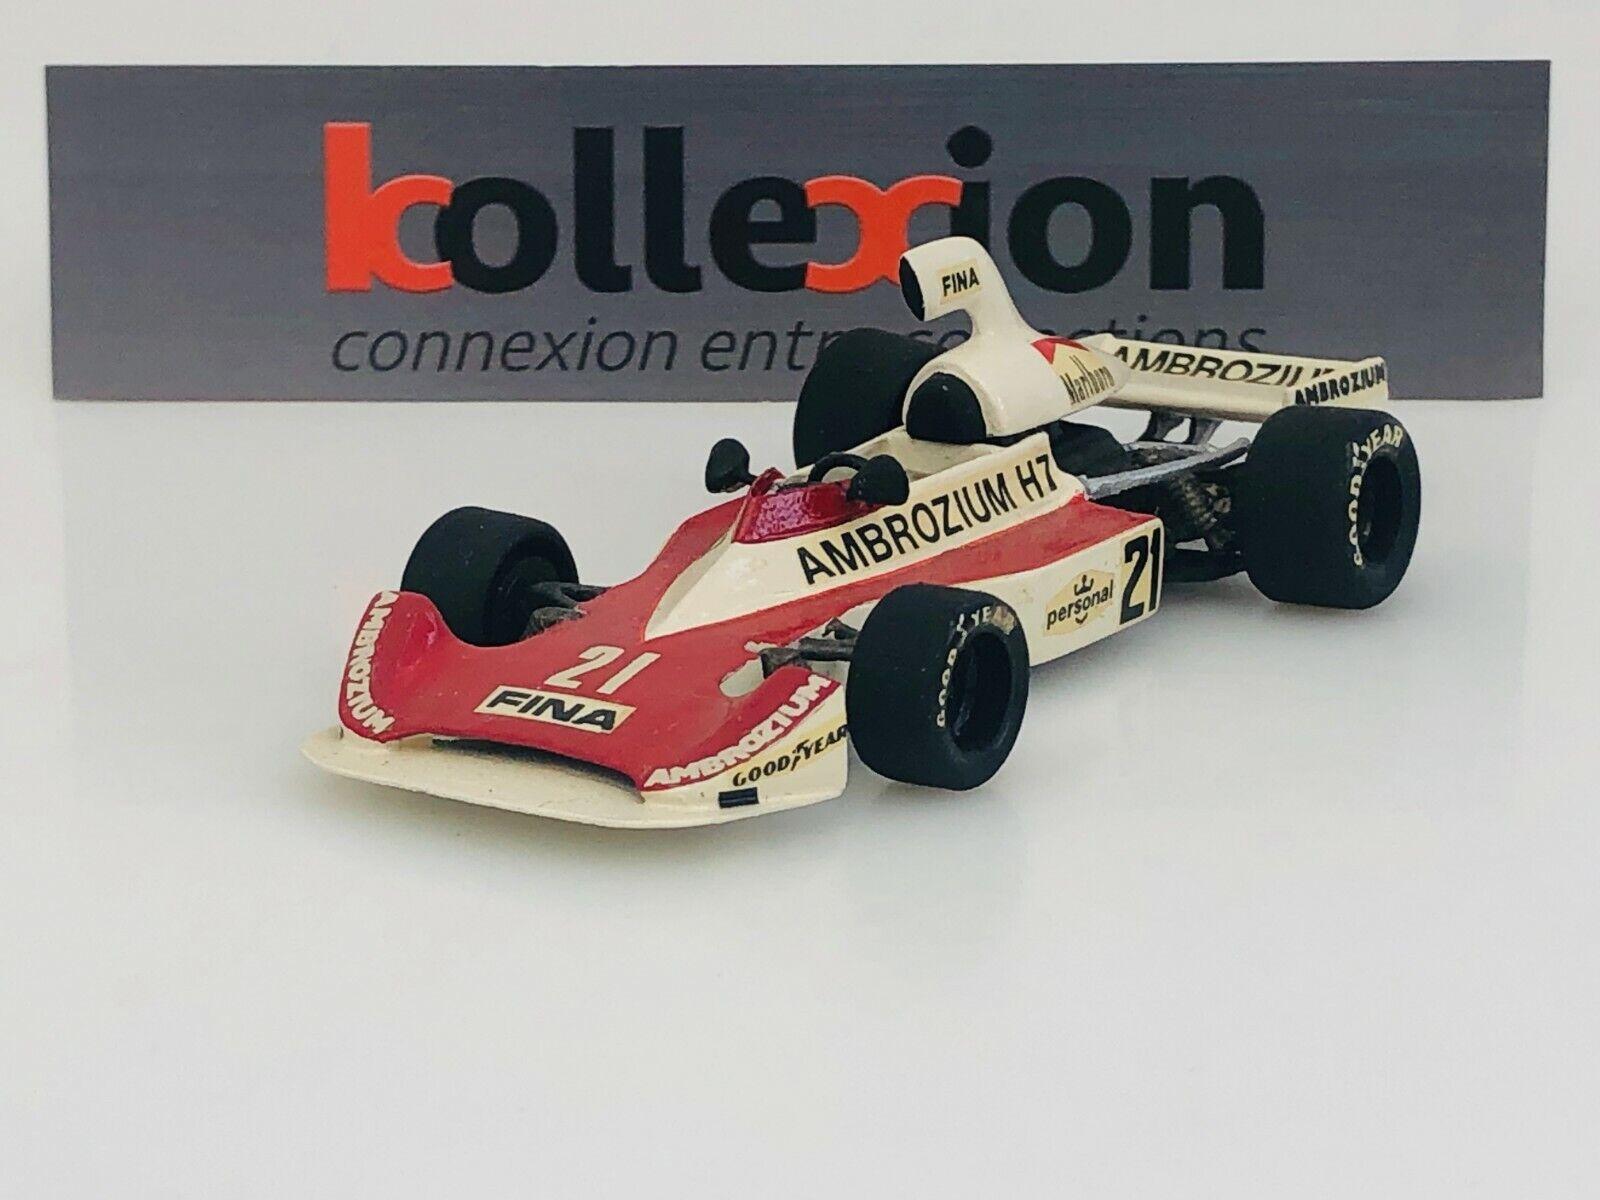 John D. Williams (johnday Williams) Williams) Williams) fw01 Ford '- 212megp F1 alemane 1975 J. Lafitte 1.43 88a